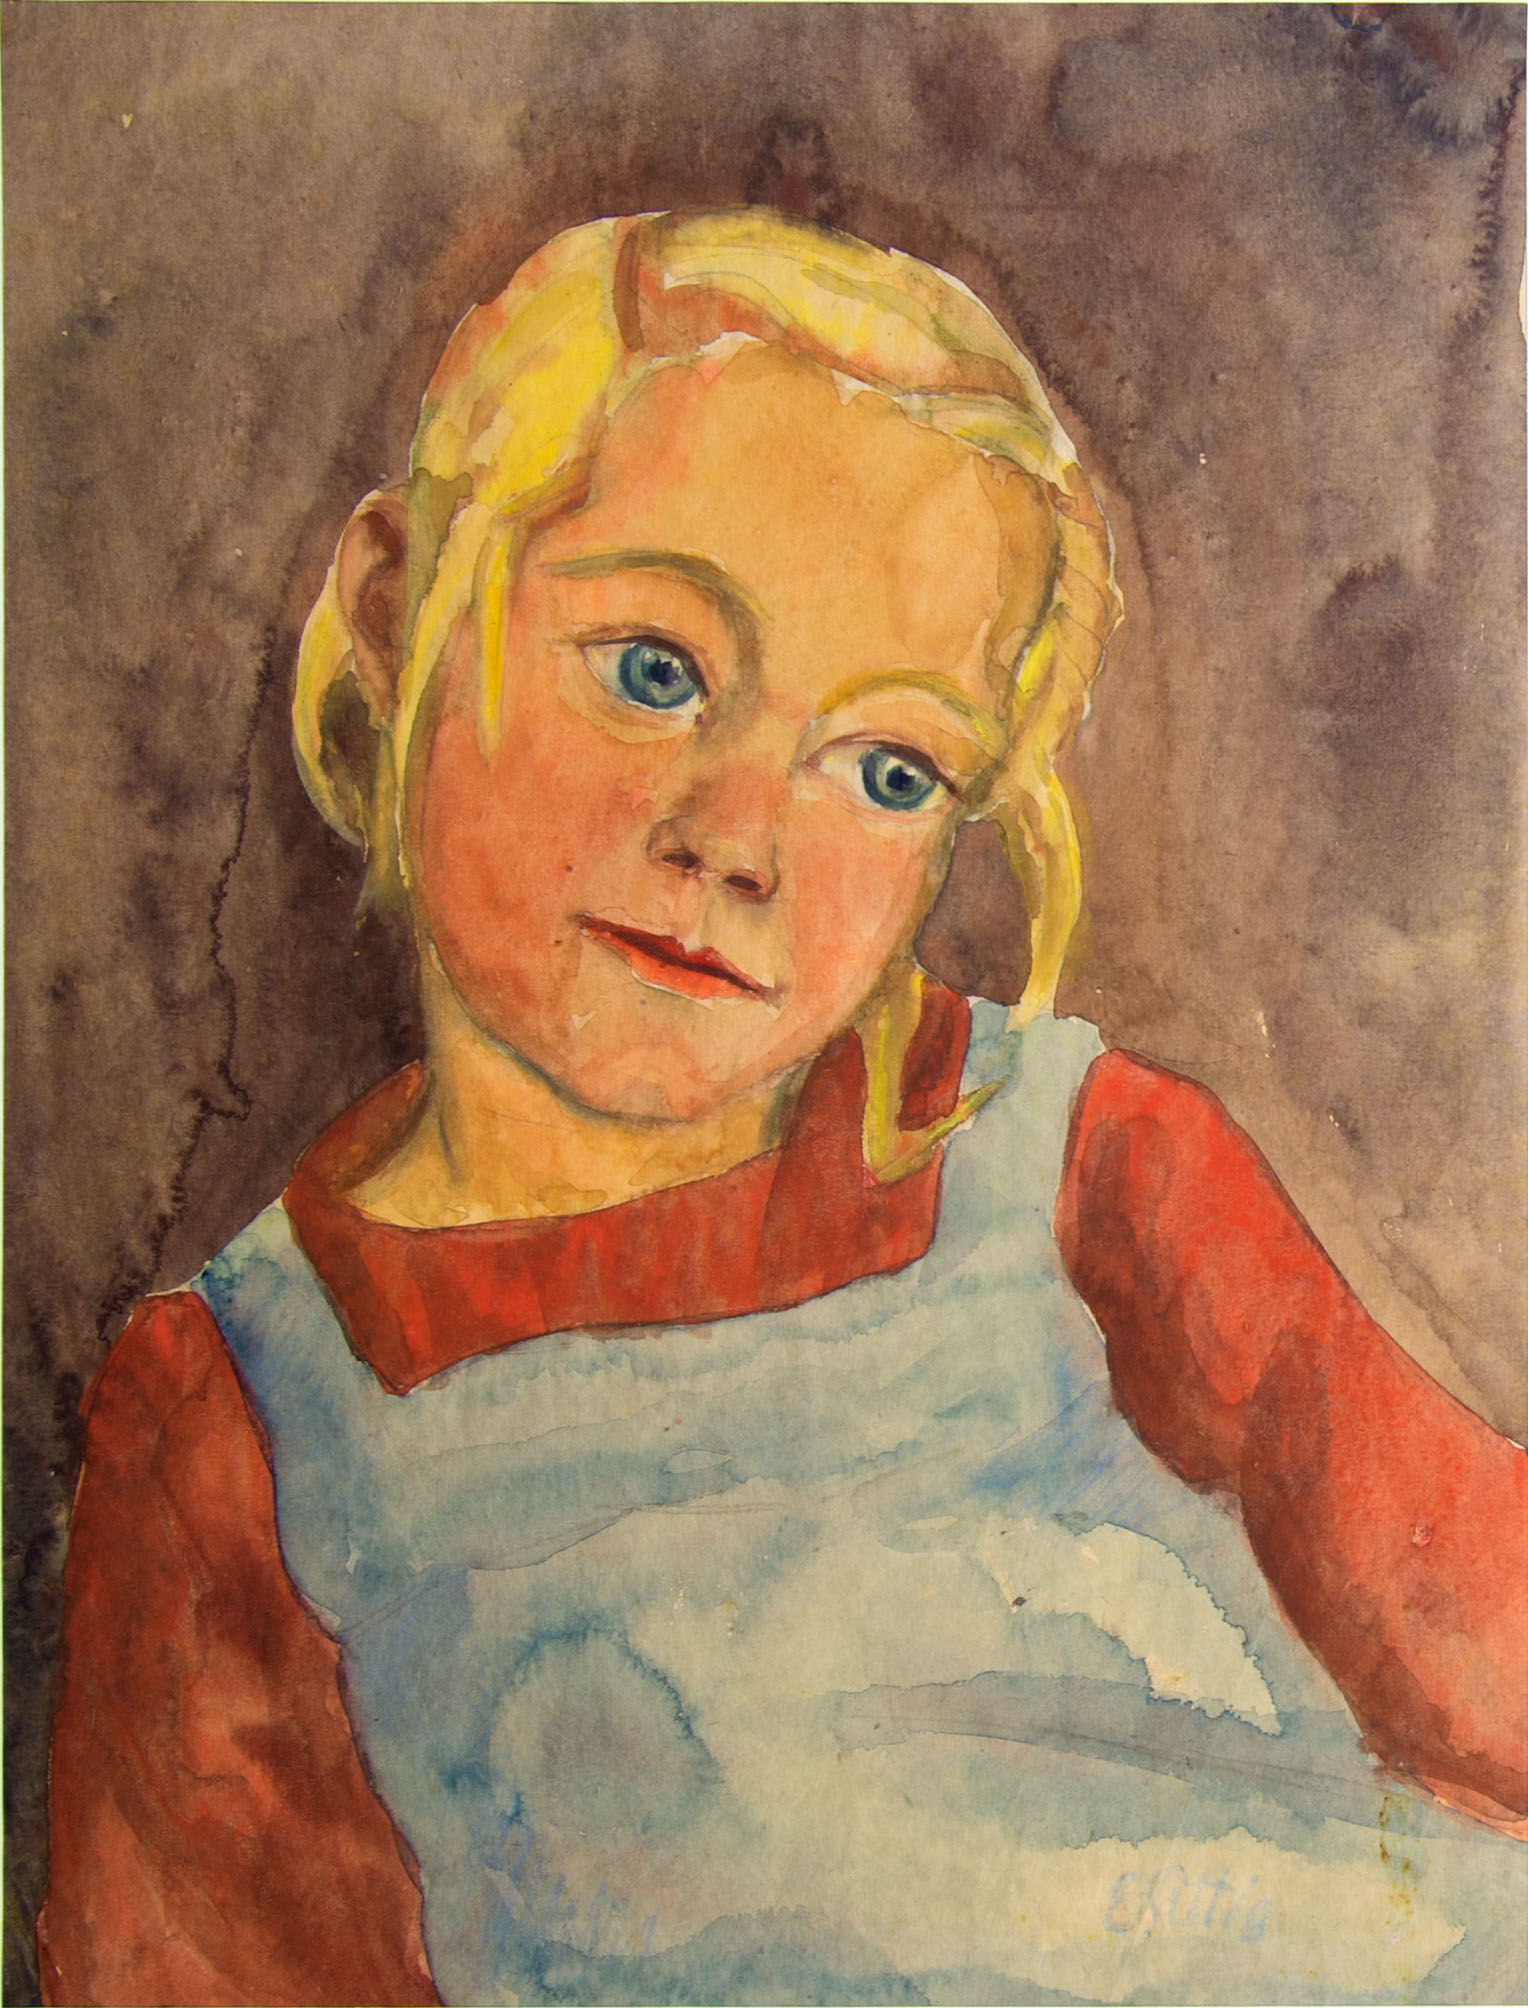 Träumender Blondschopf o. J. (1920er-Jahre) Aquarell auf Papier 49,0 x 37,5 cm